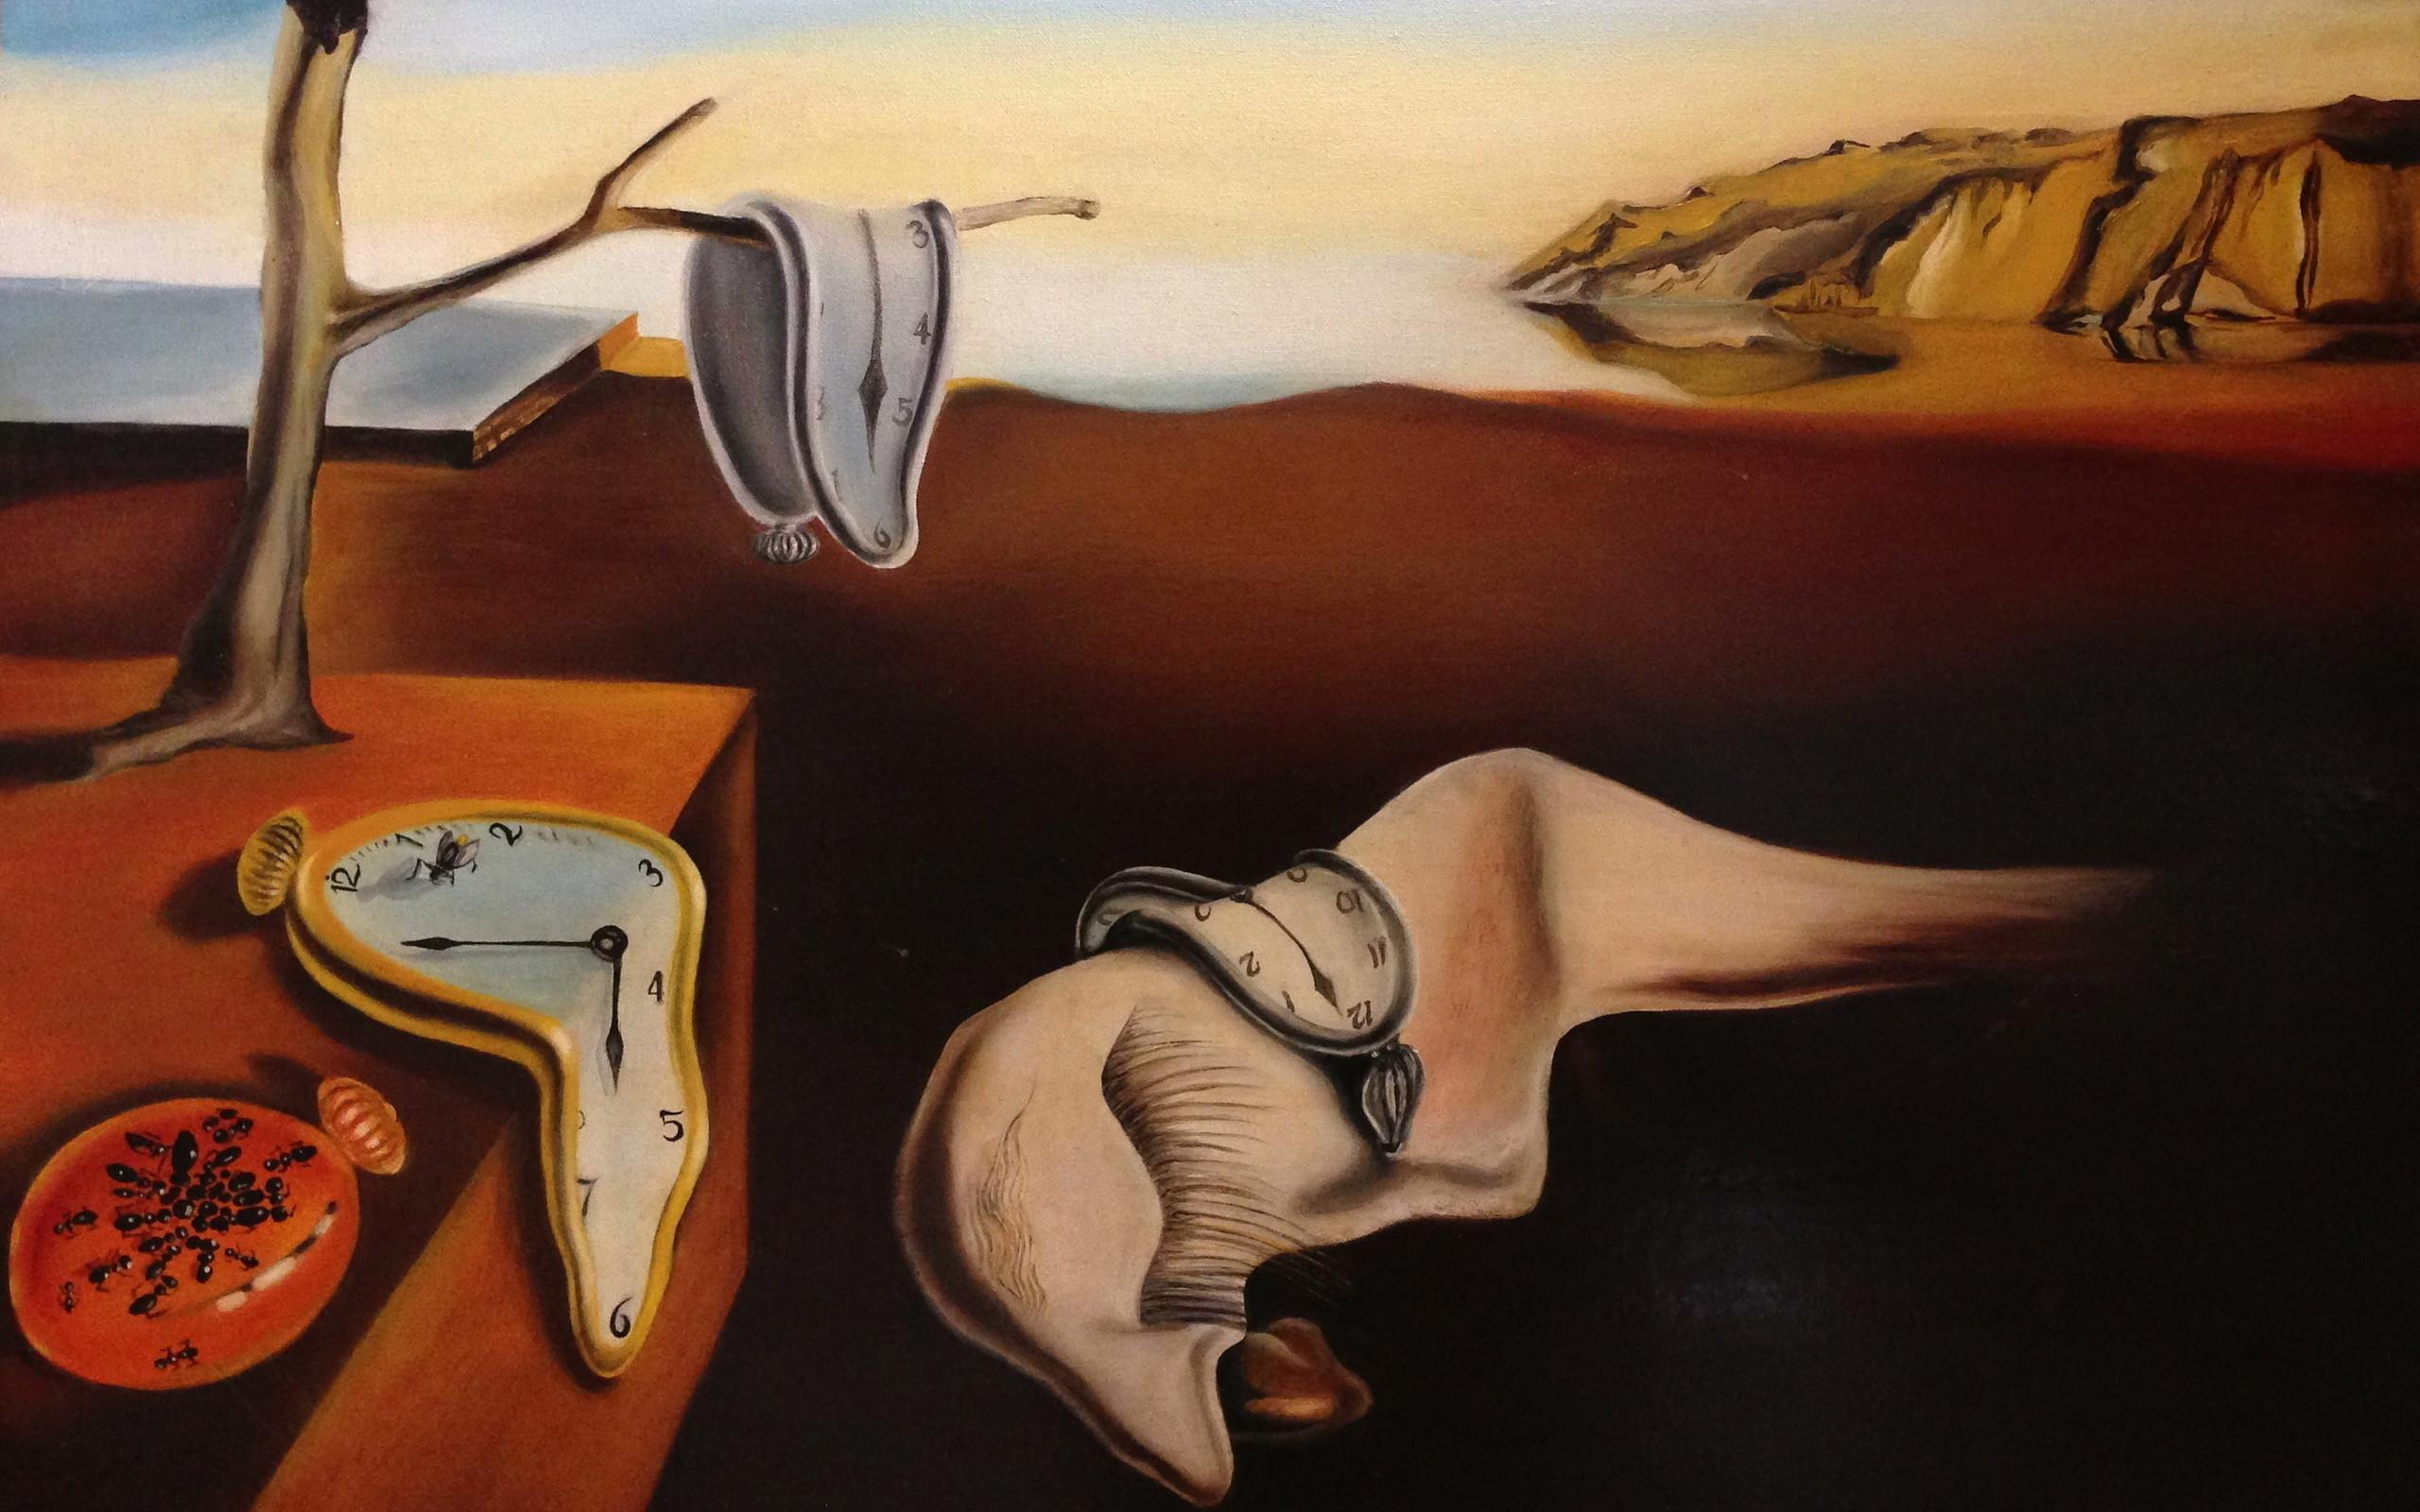 selvador dali essay Essays: salvador dali, the greatest artist for my artist report i chose salvador dali, the spanish surrealist painter salvador felipe jacinto dali was born in.